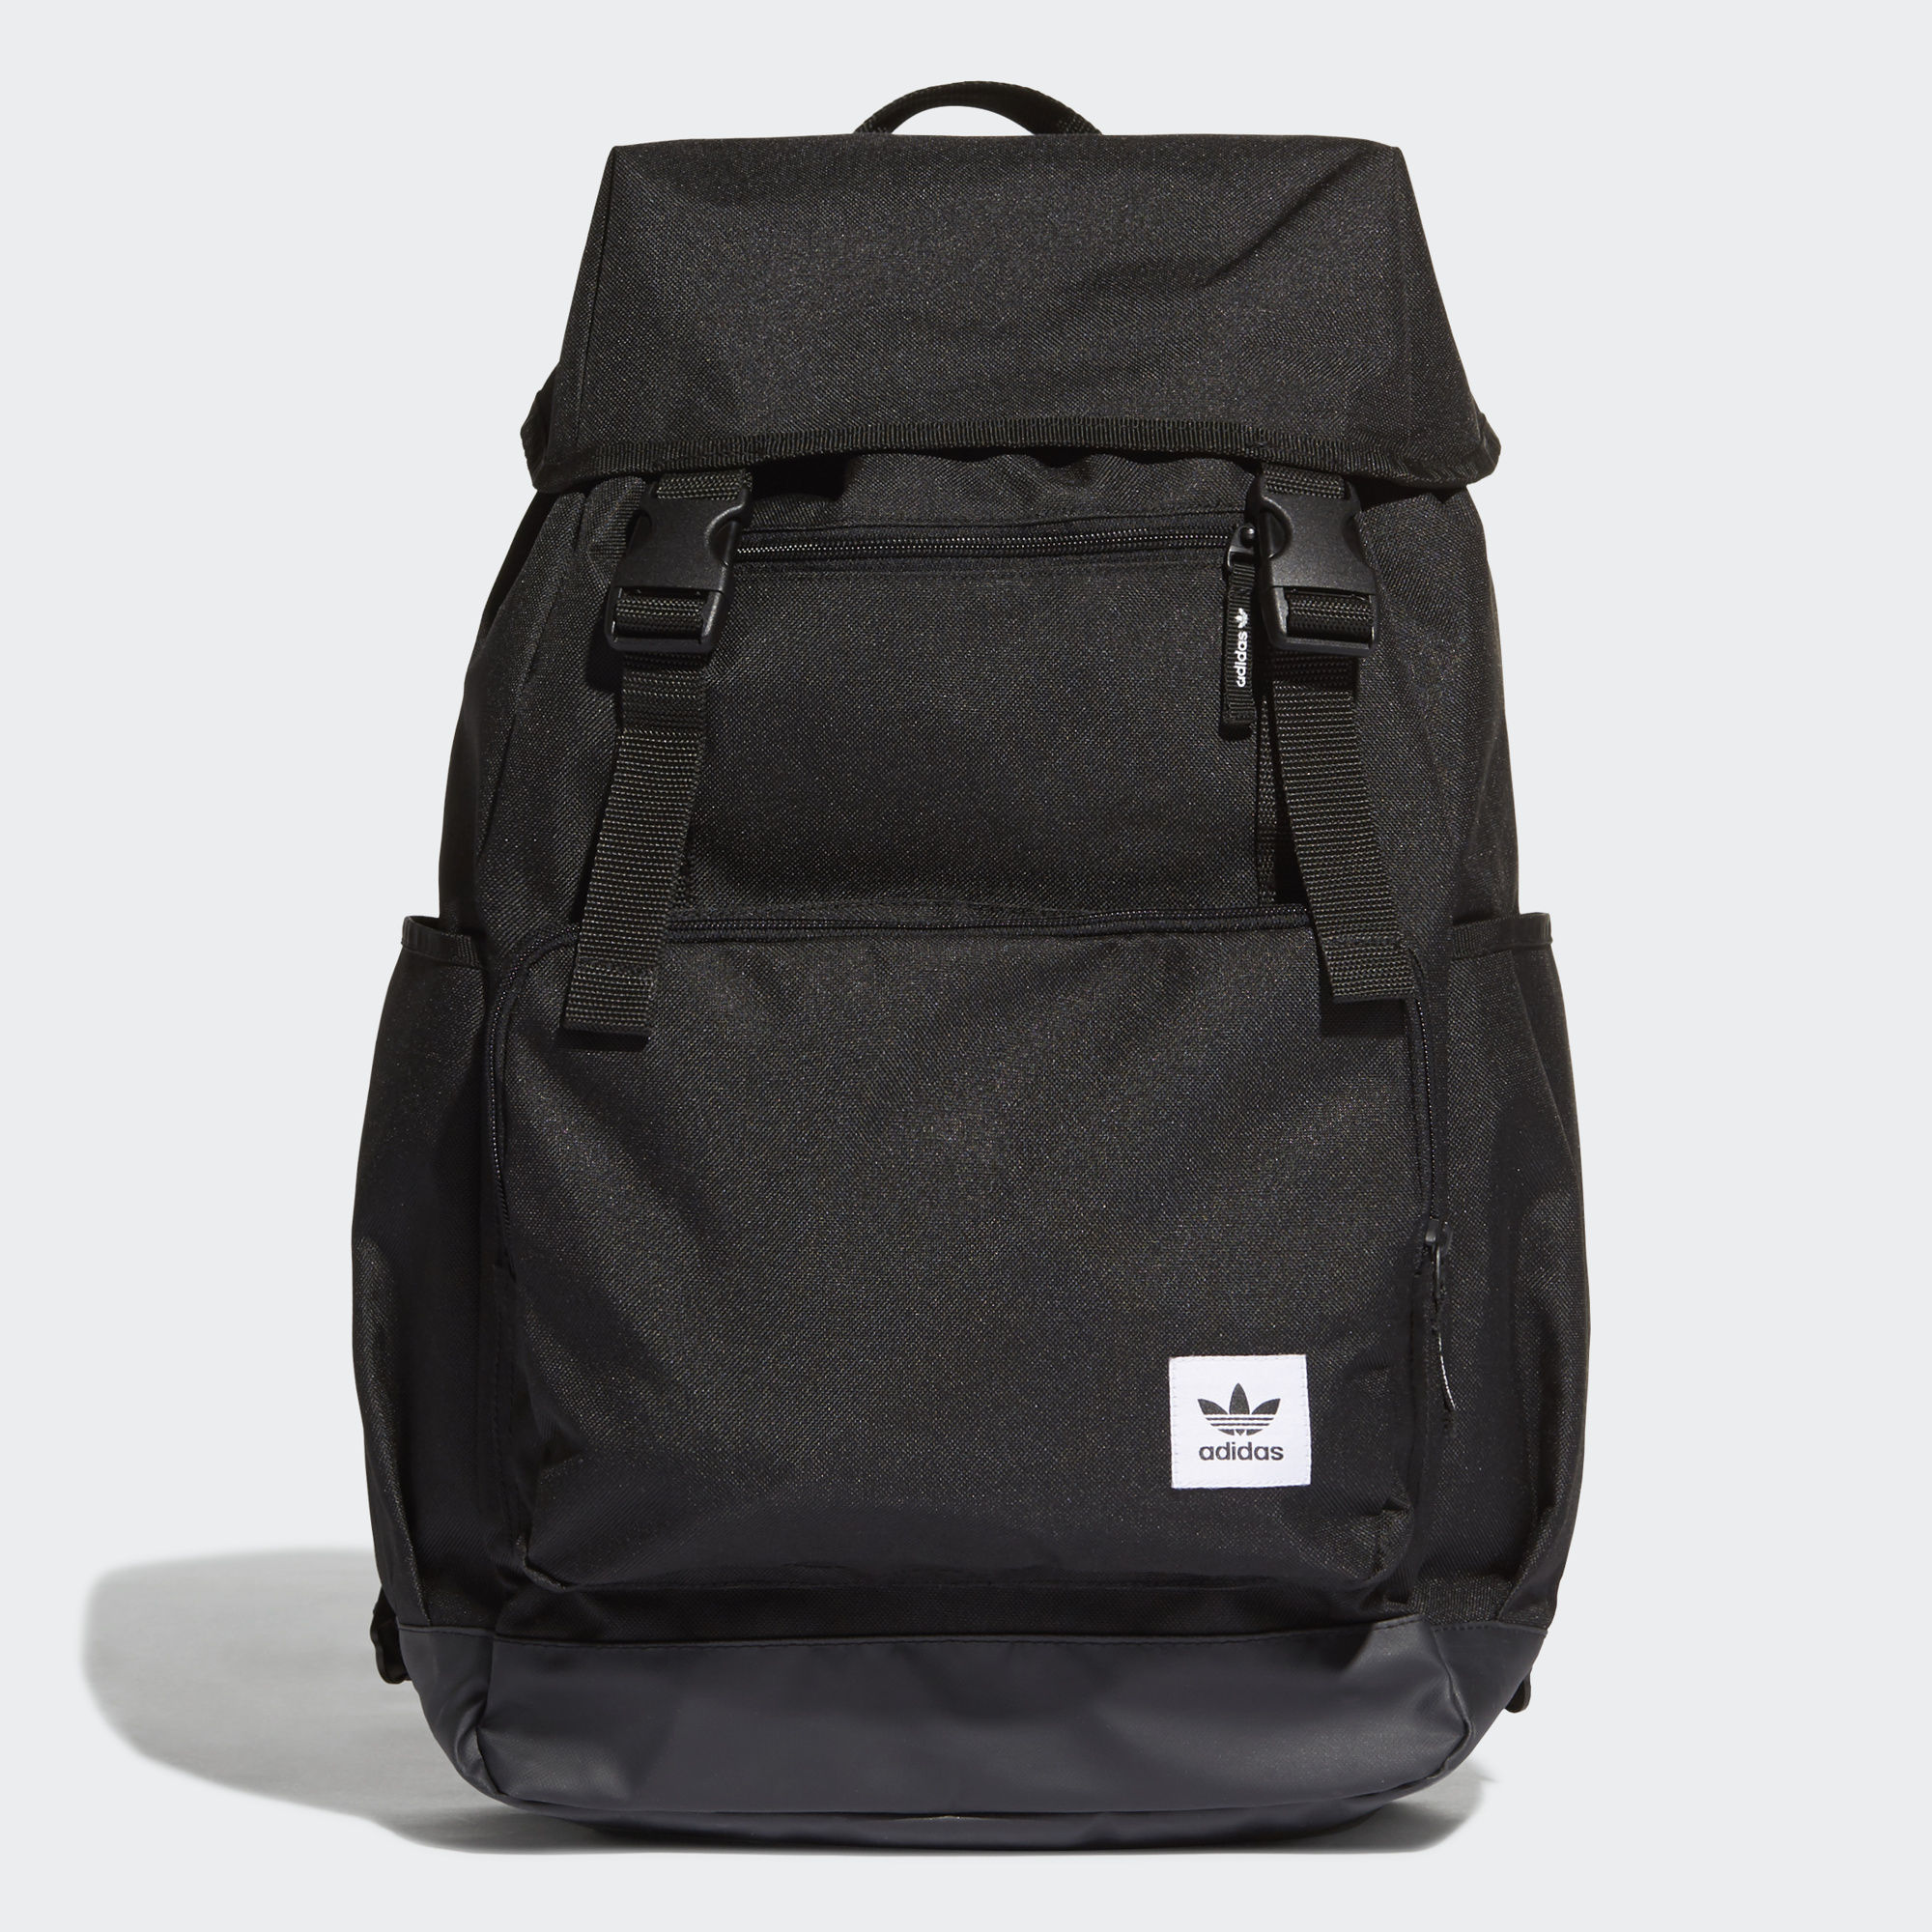 5c79782808 adidas Originals Top Loader Backpack - SPORTING GOODS Backpacks ...